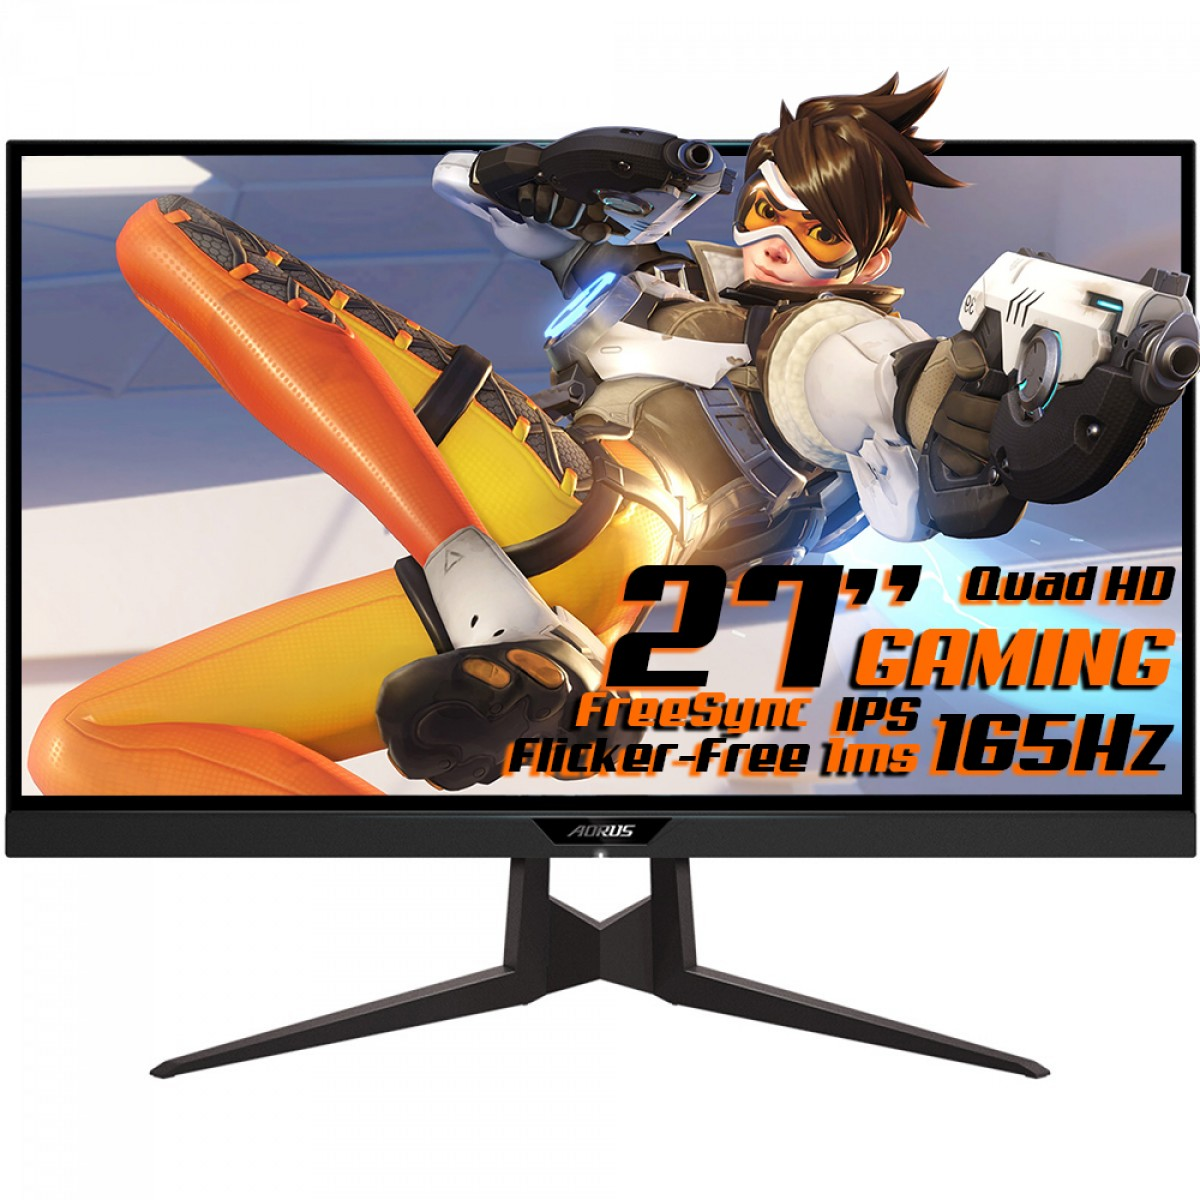 Monitor Gamer Gigabyte Aorus FI27Q-P, 27 Pol, QuadHD, 165Hz, 1ms, IPS, FreeSync, HDR, DP/HDMIx2, 20VM0-AFI27QPBA-1SAR